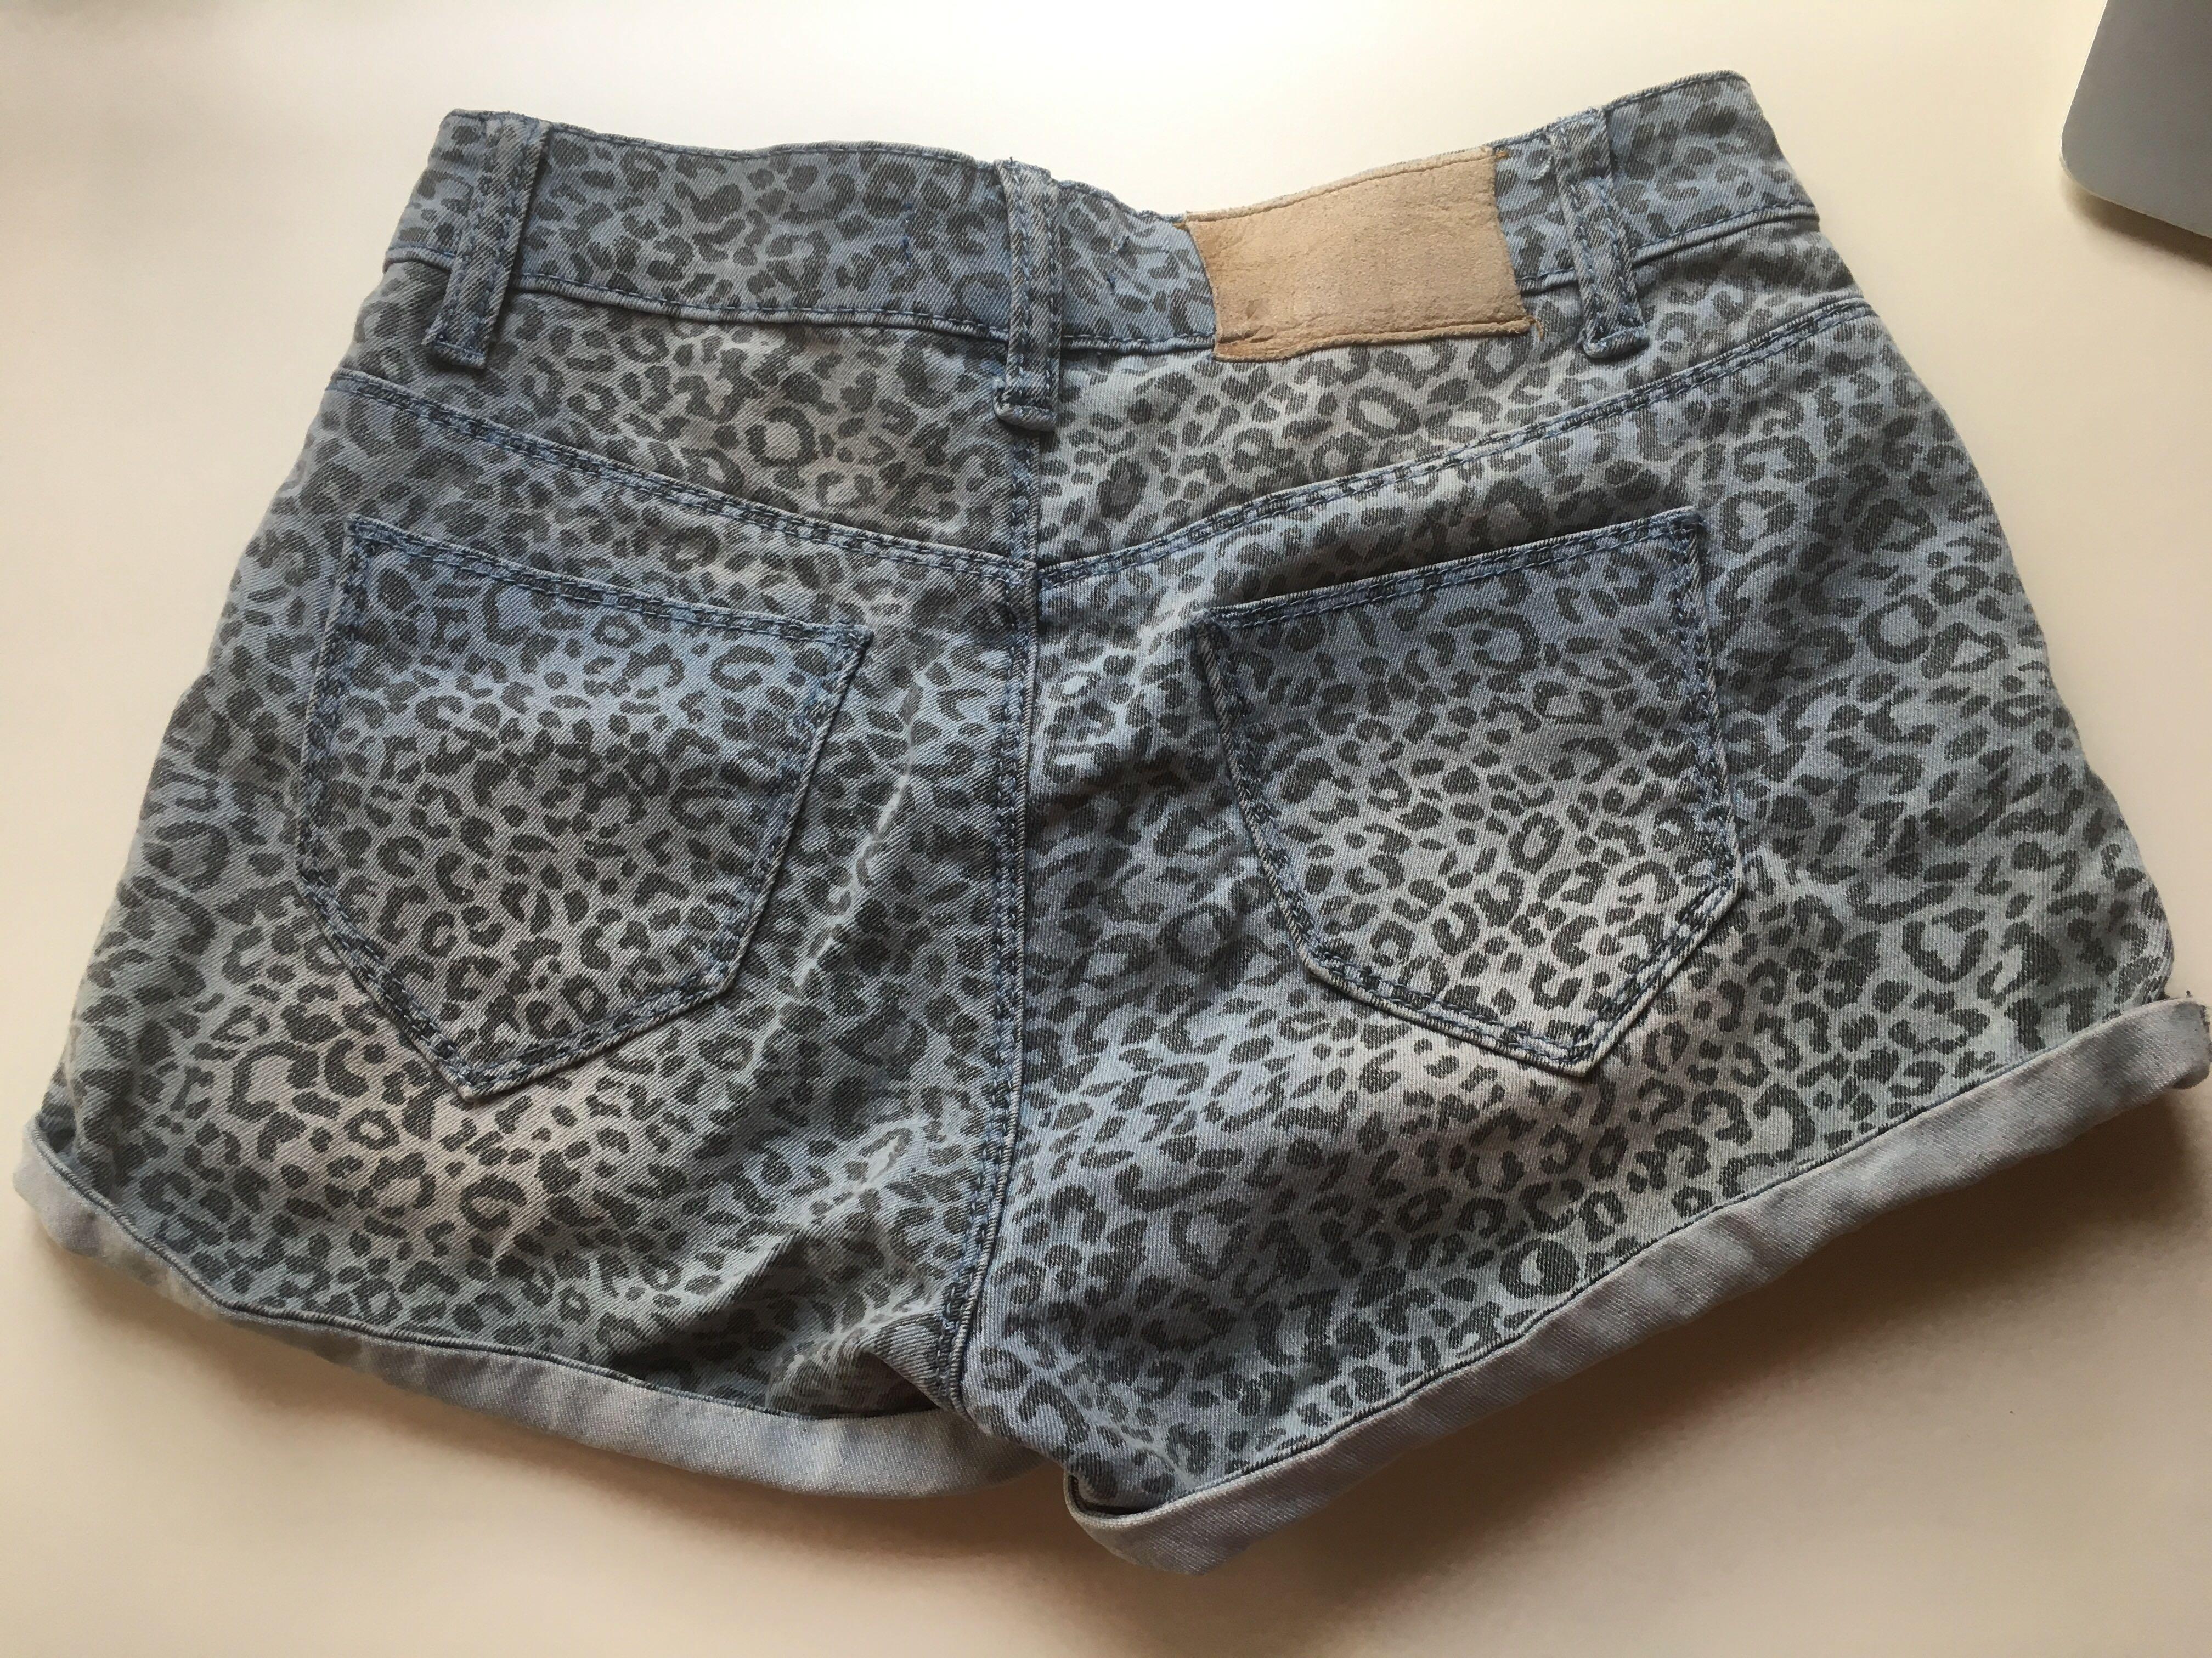 Leopard Print Denim Shorts